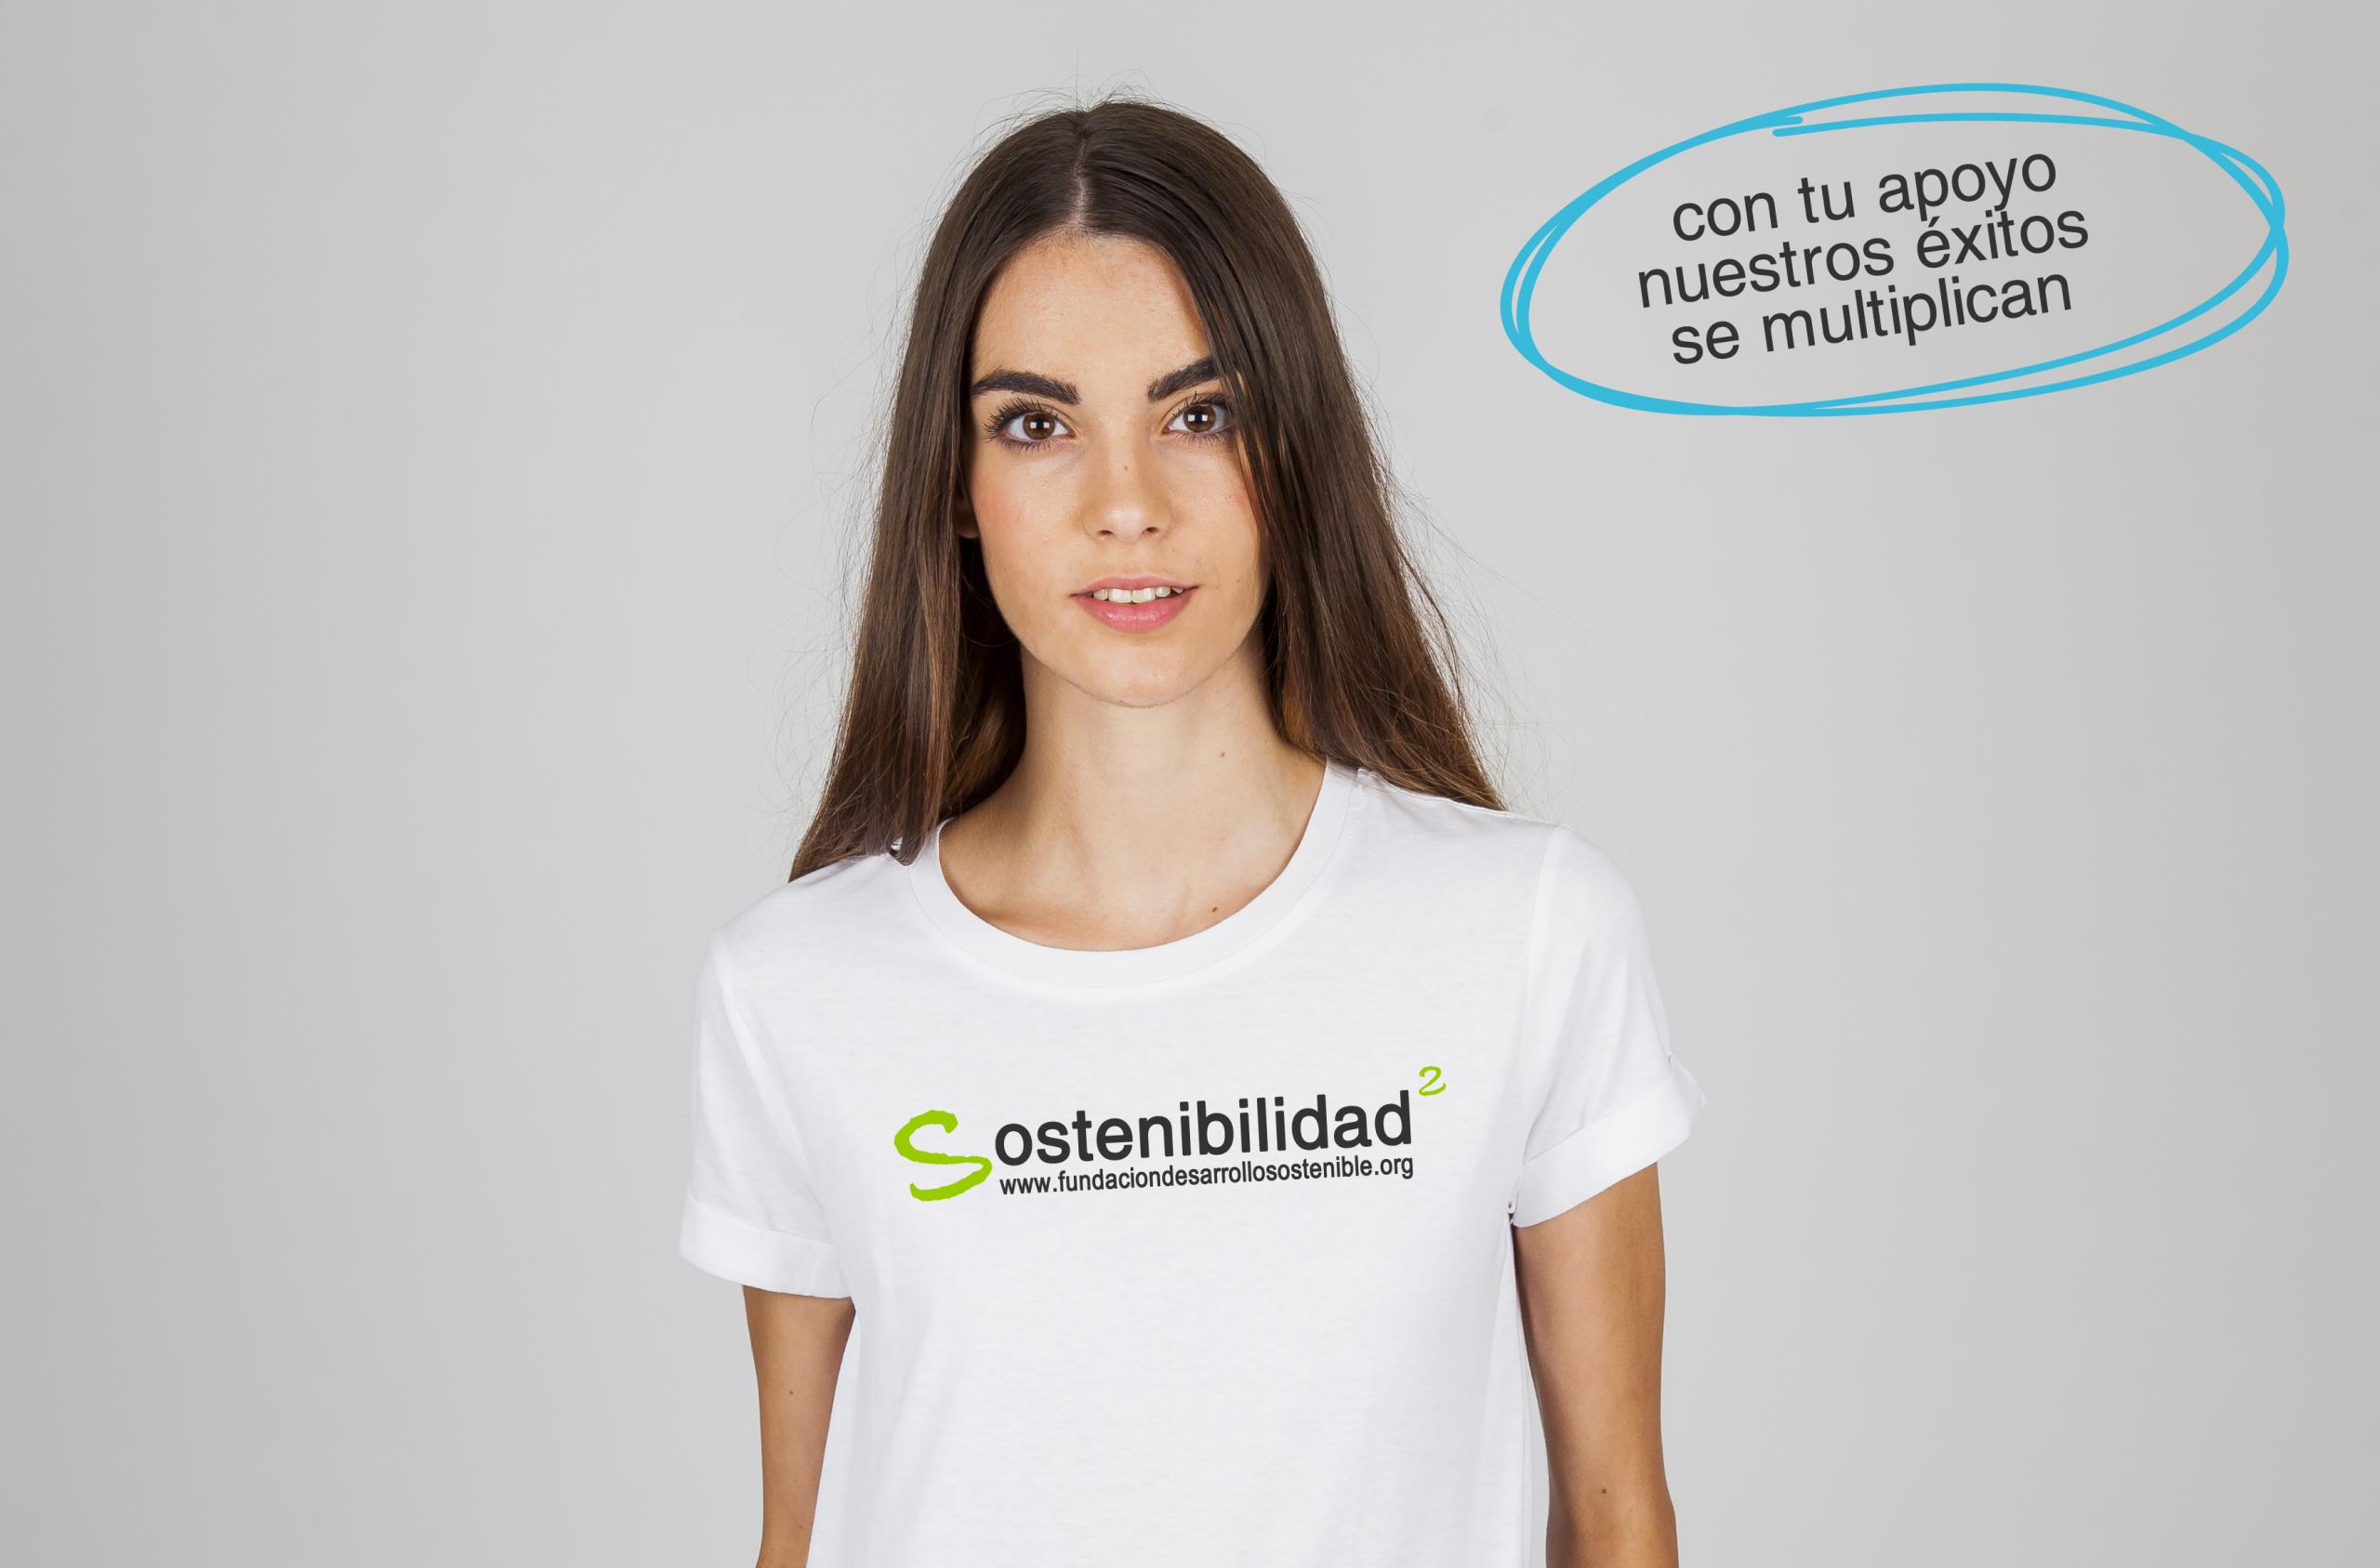 camiseta chica - Apadrina un proyecto